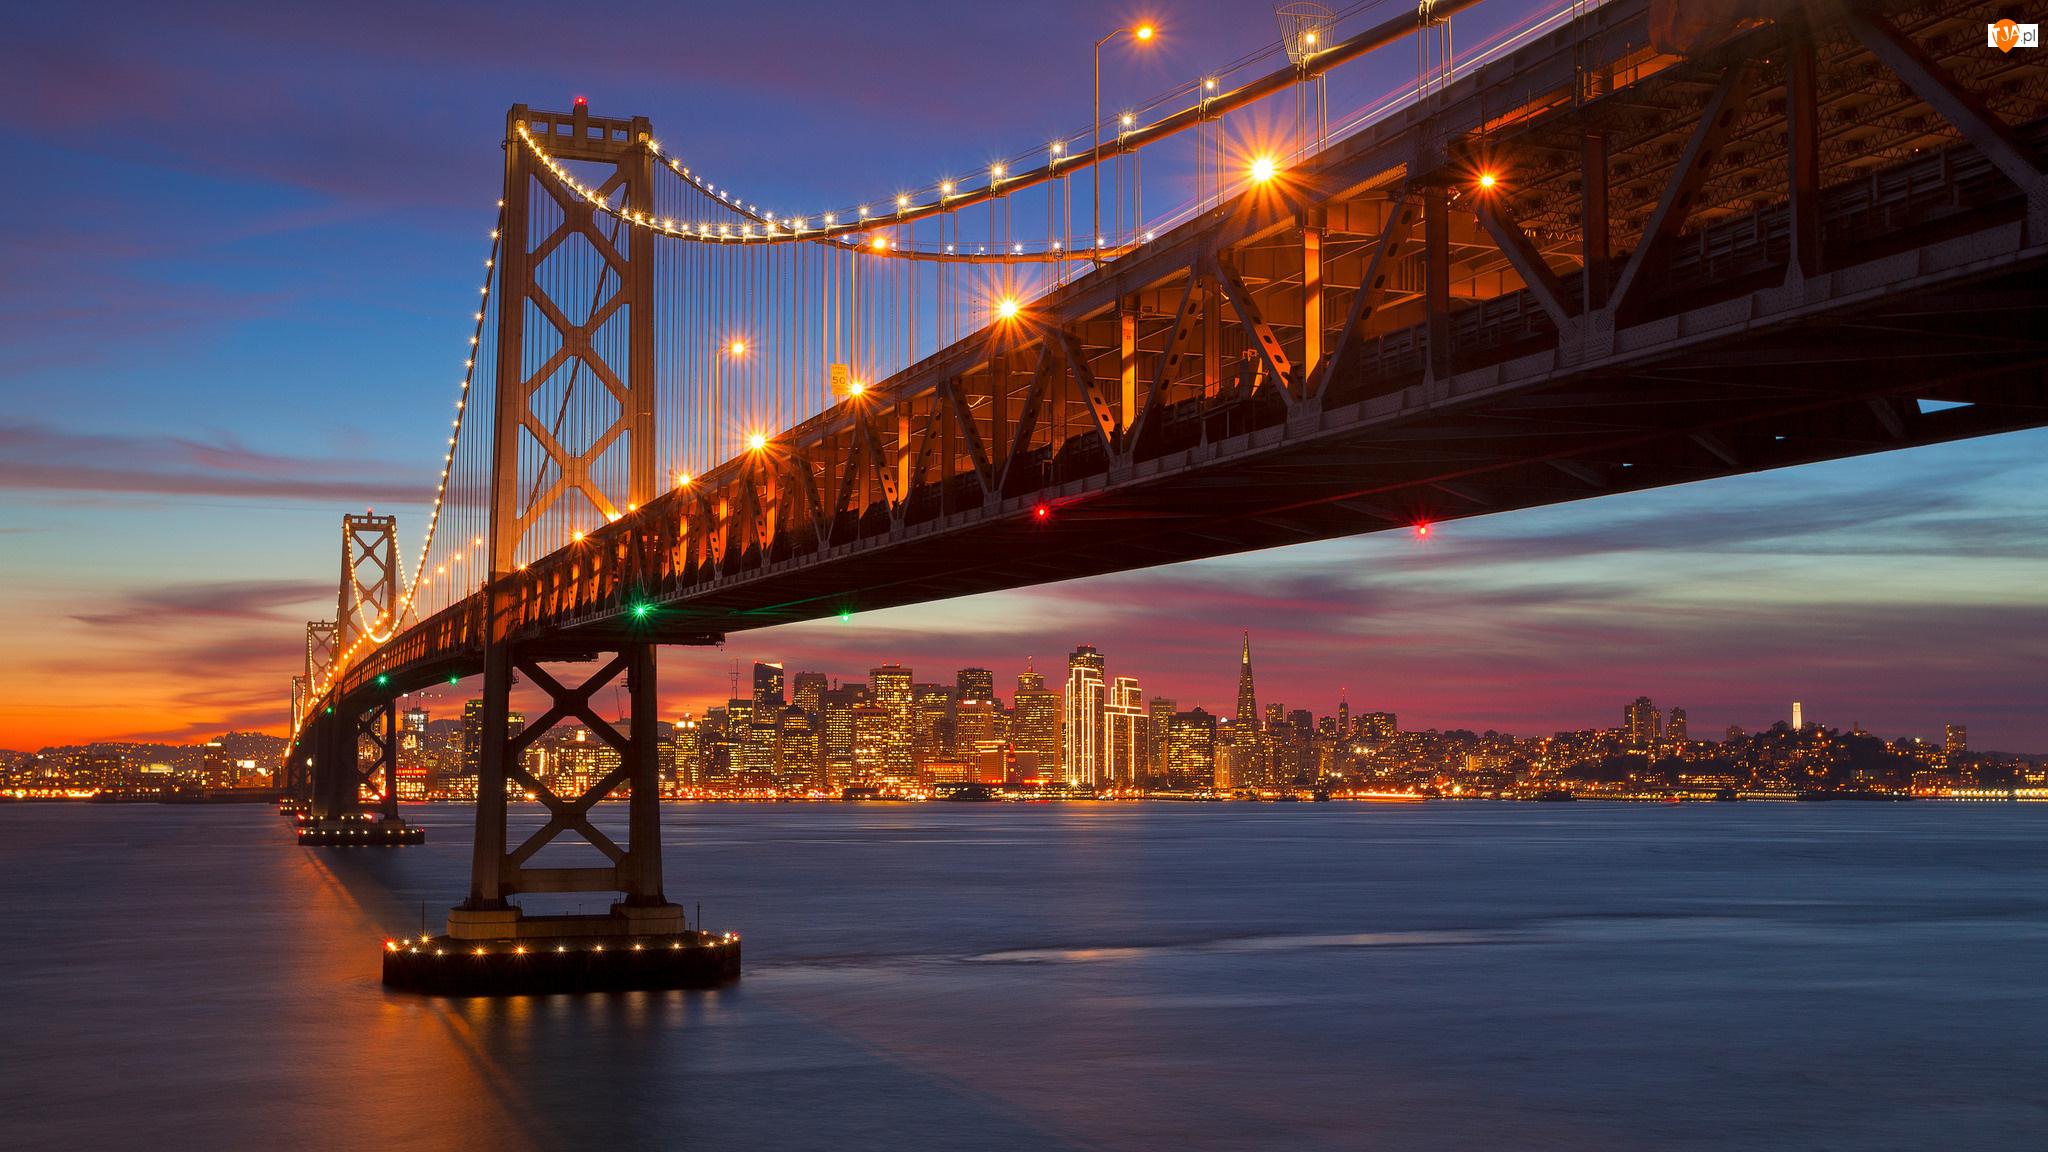 Zachód Słońca, Stany Zjednoczone, Most San Francisco-Oakland Bay, San Francisco, Zatoka San Francisco